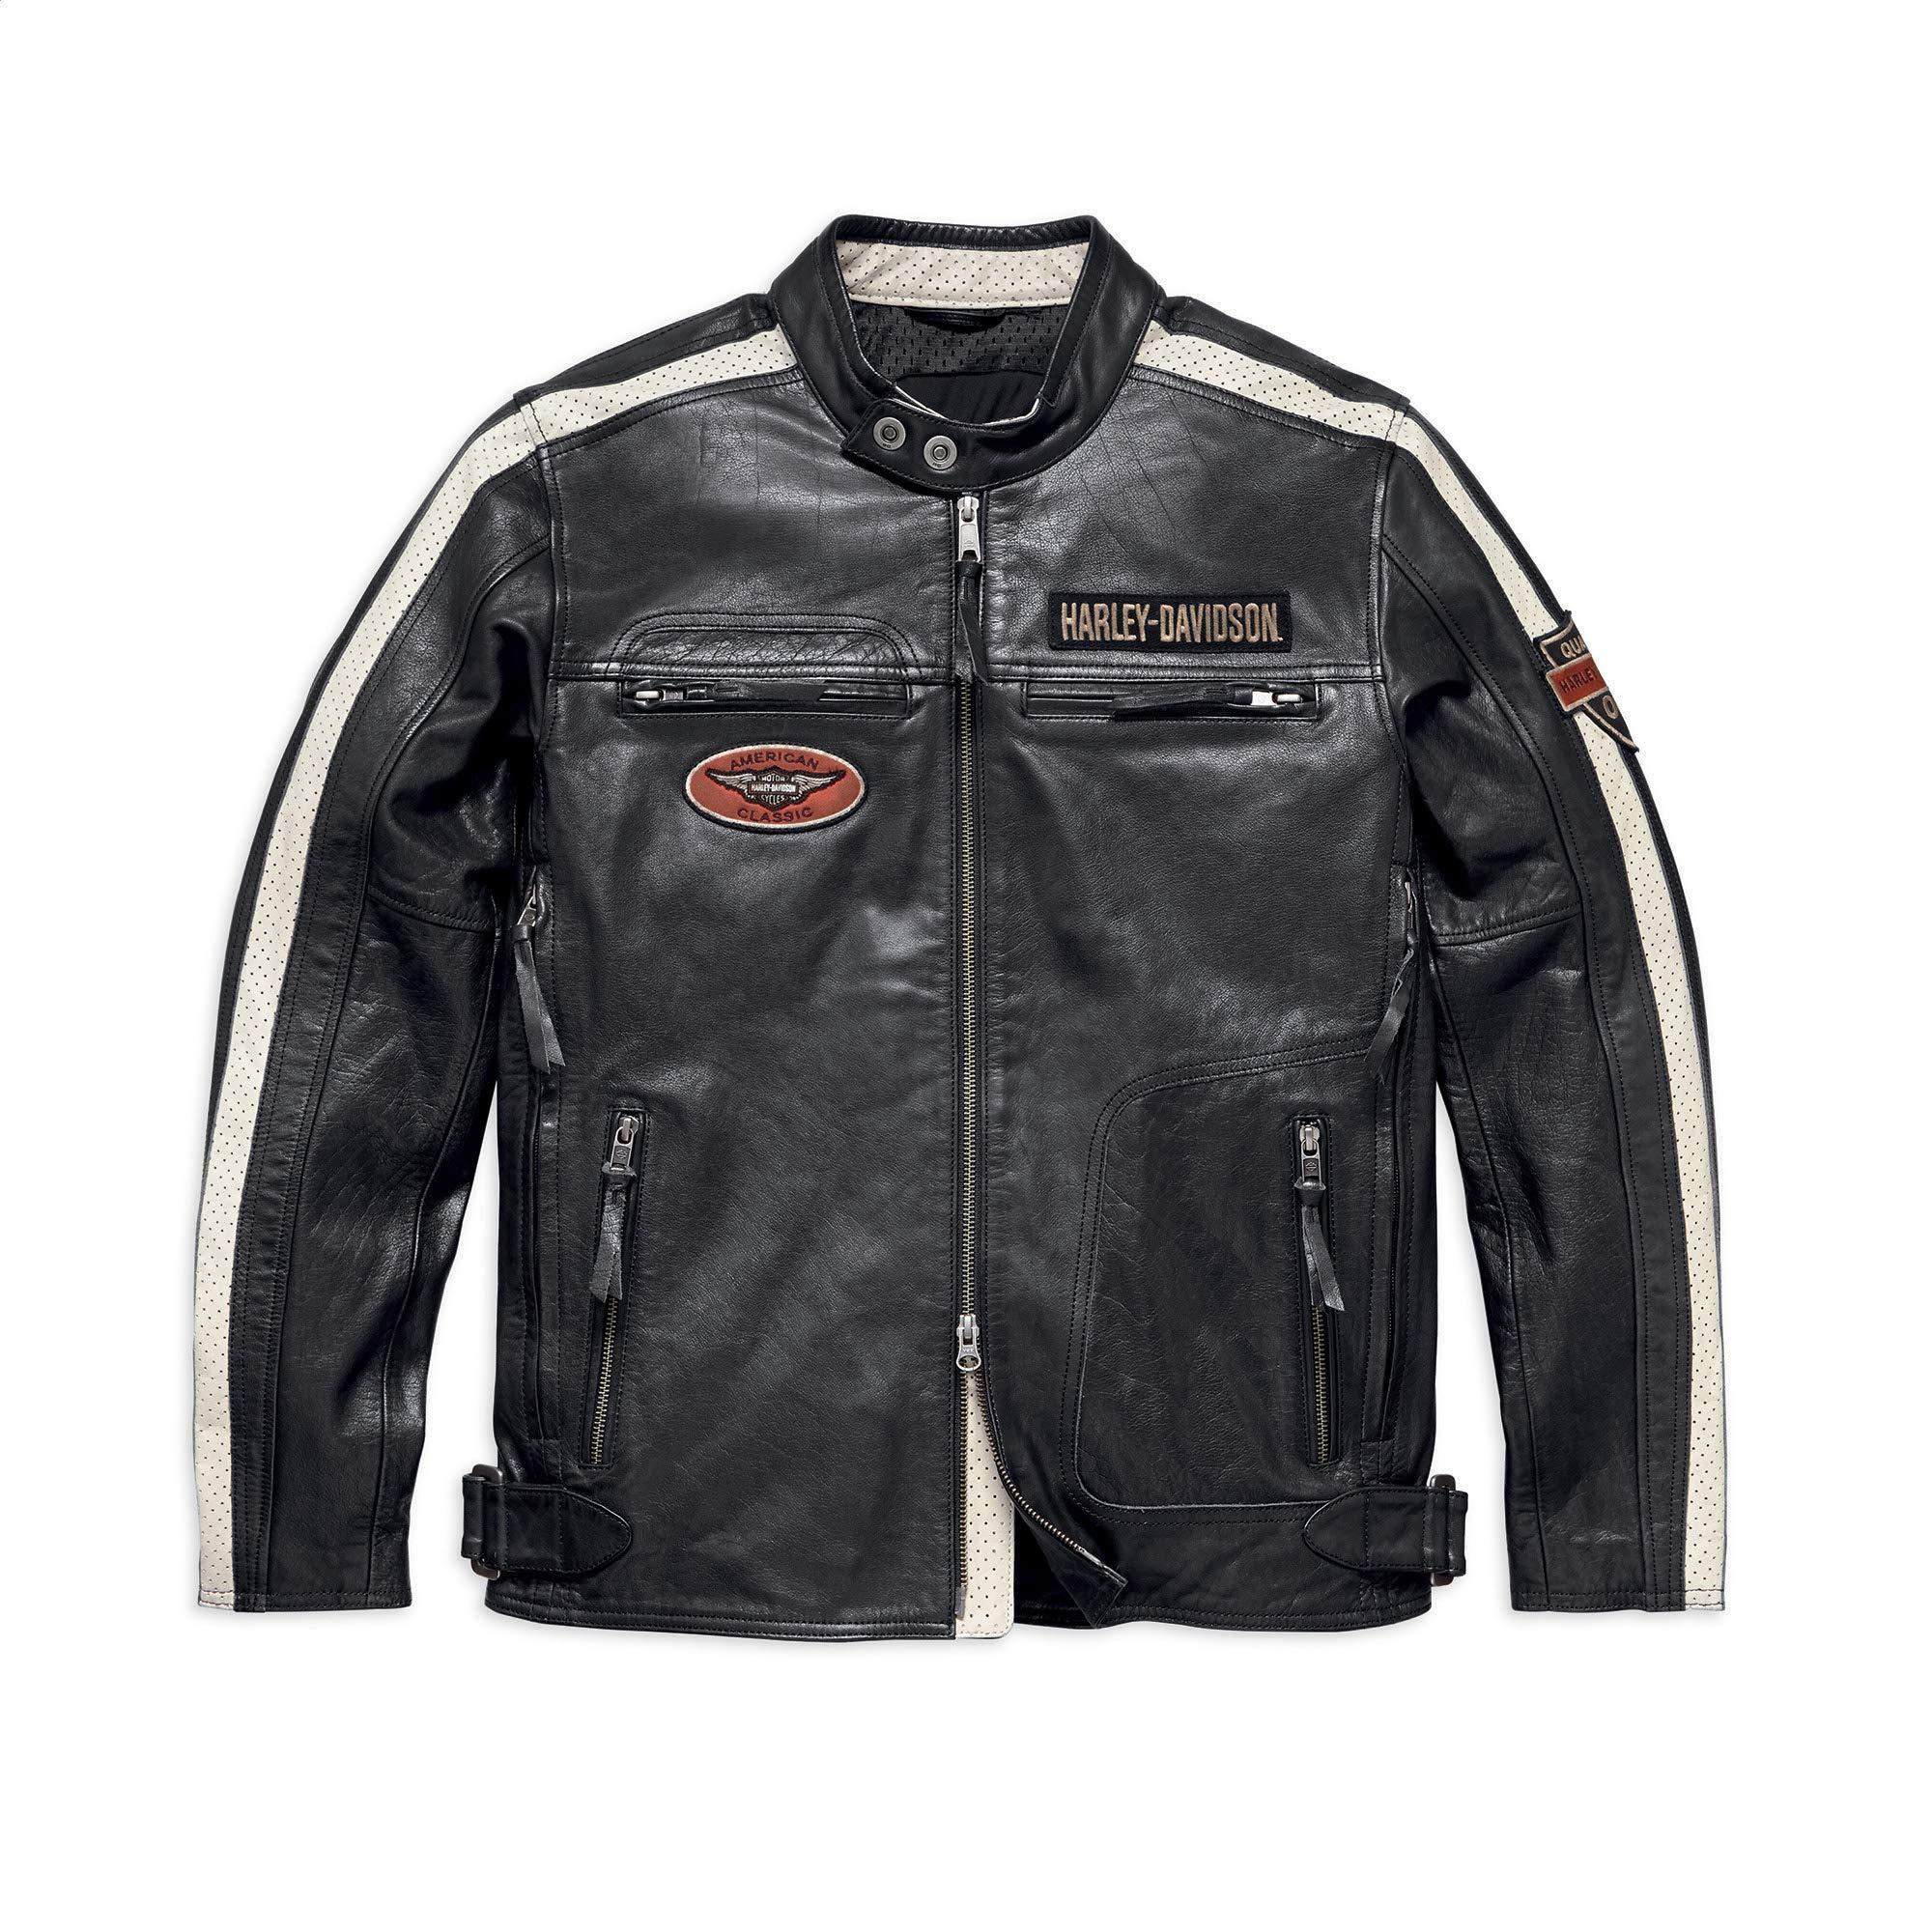 : Harley Davidson